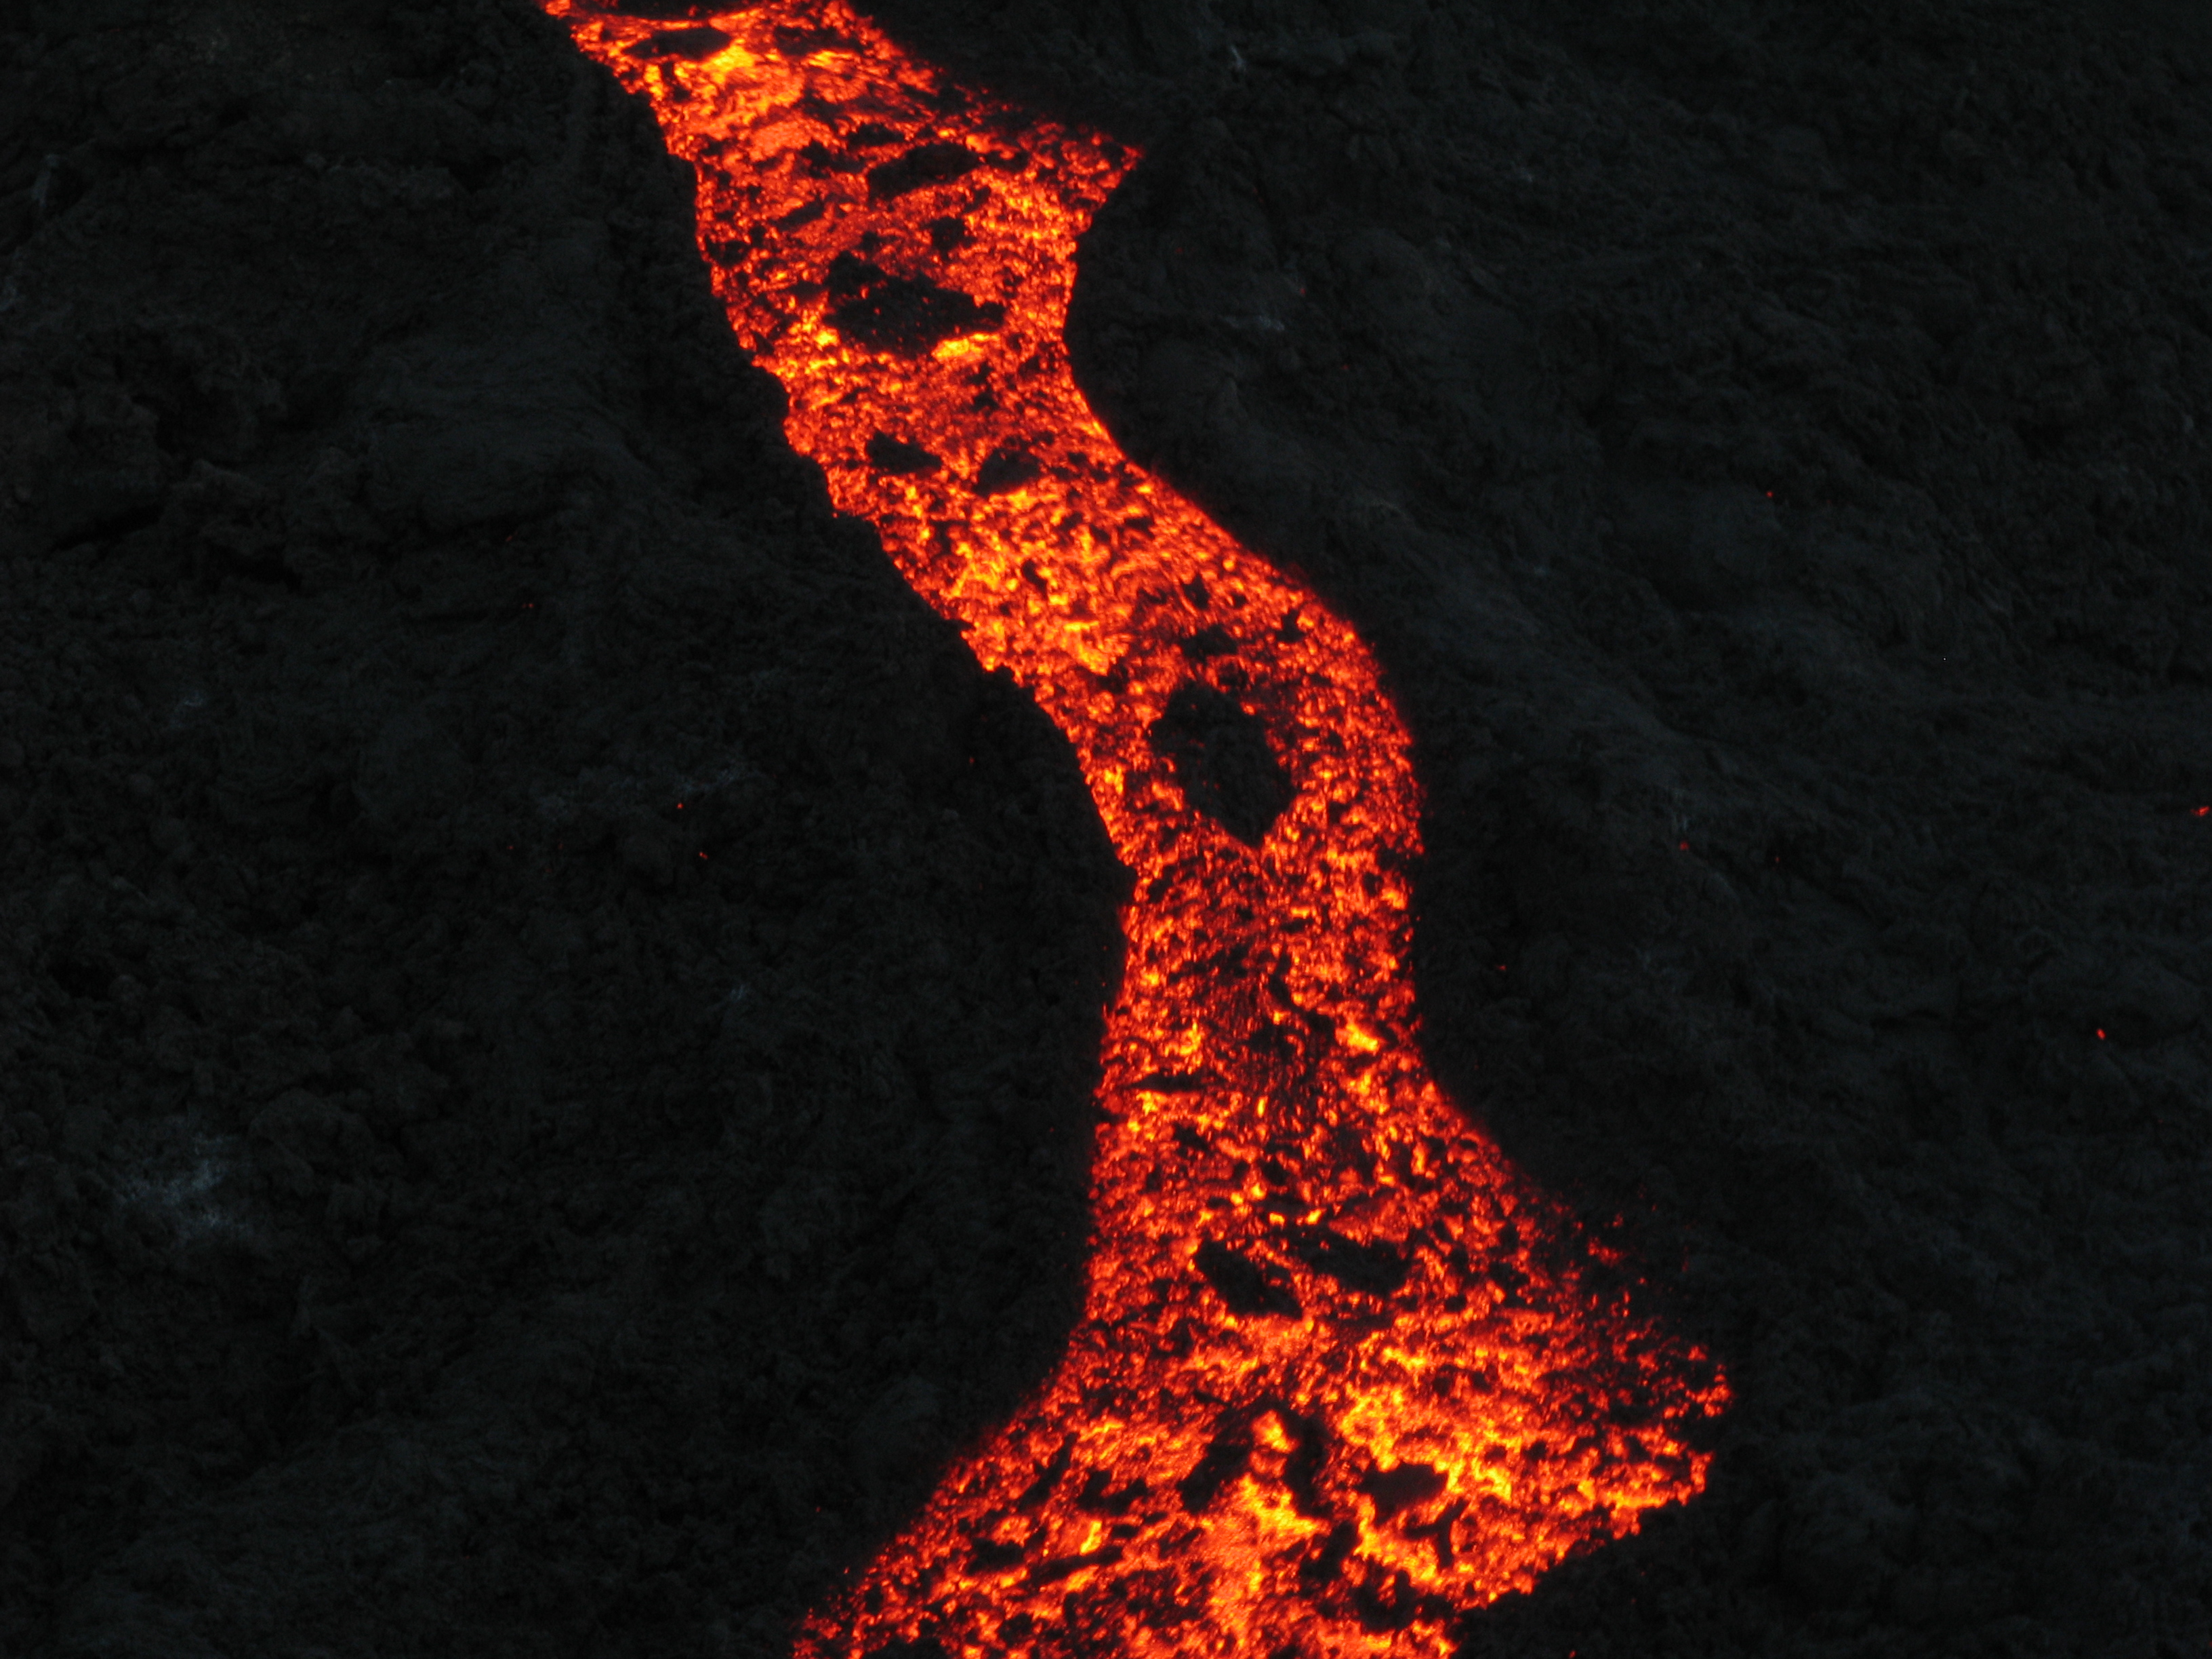 Crosta volcànica